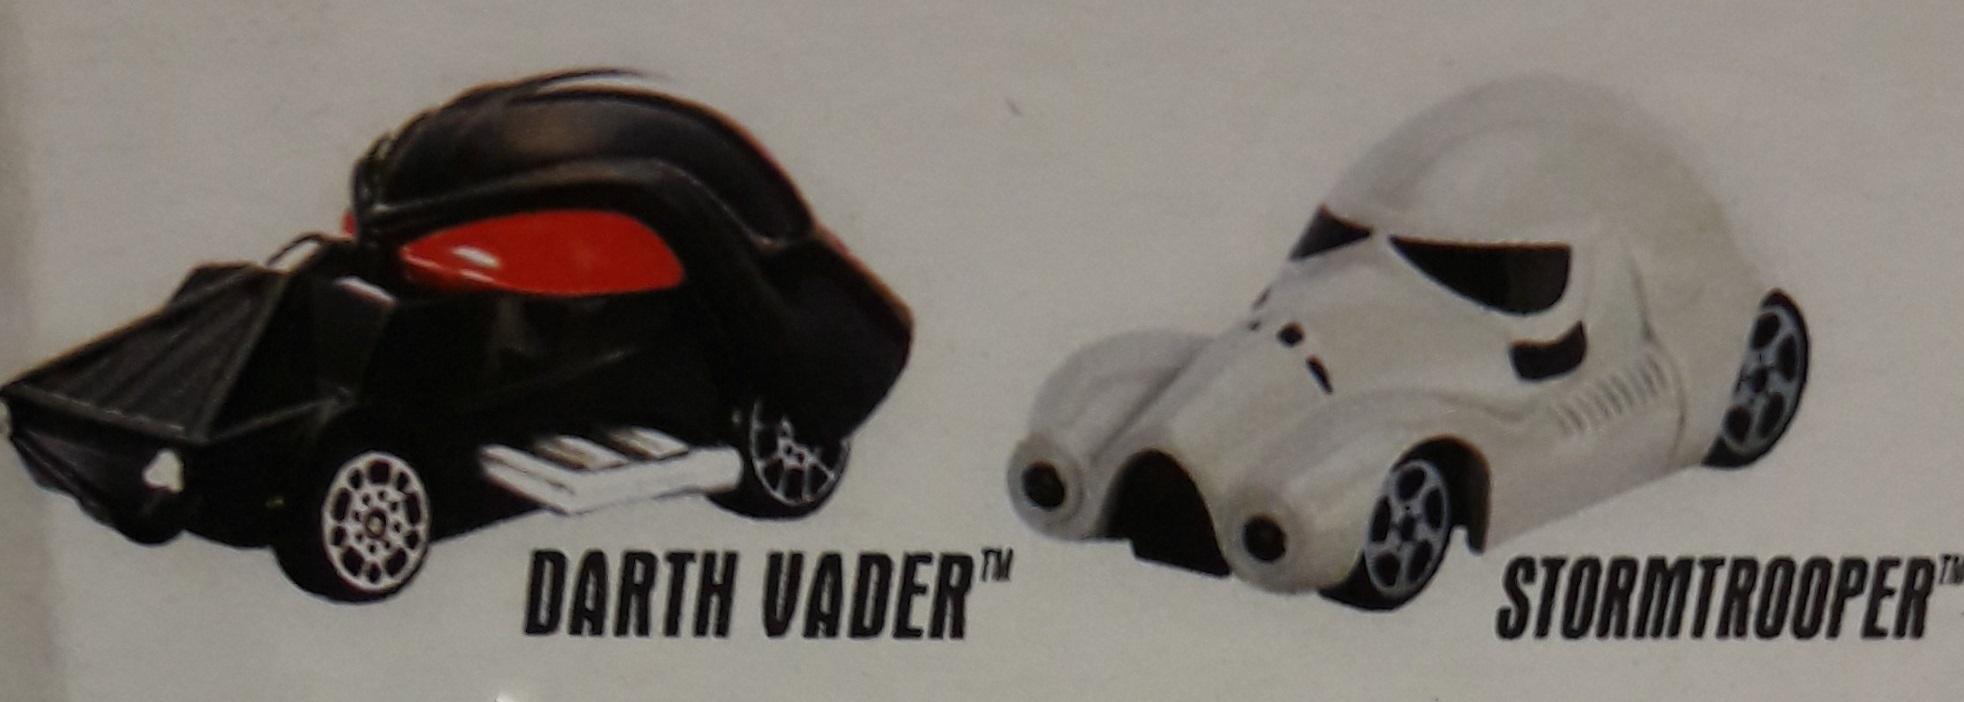 Hot Wheels машинки star wars 2 шт DARTH VADER+ STORMROOPER